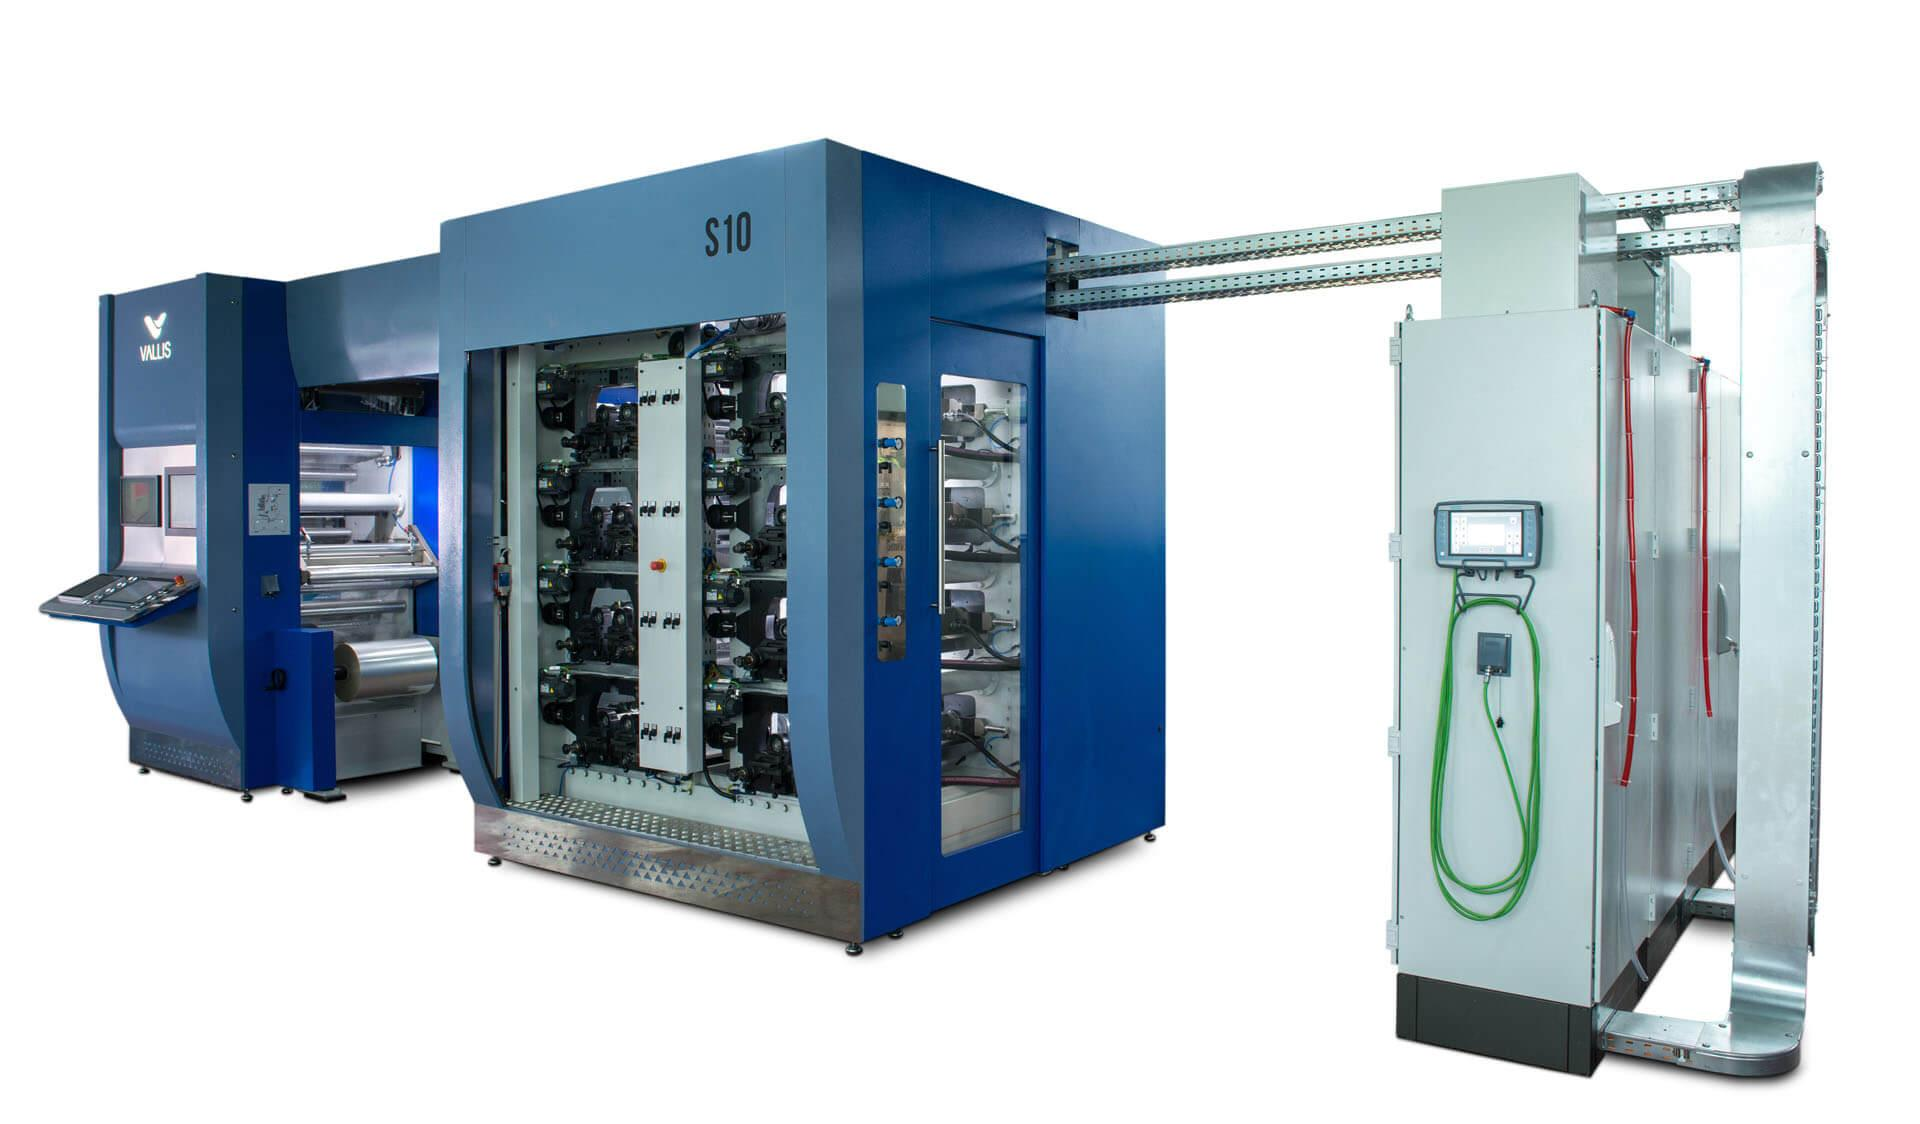 flexo-printing-machine-S10-vallis-02